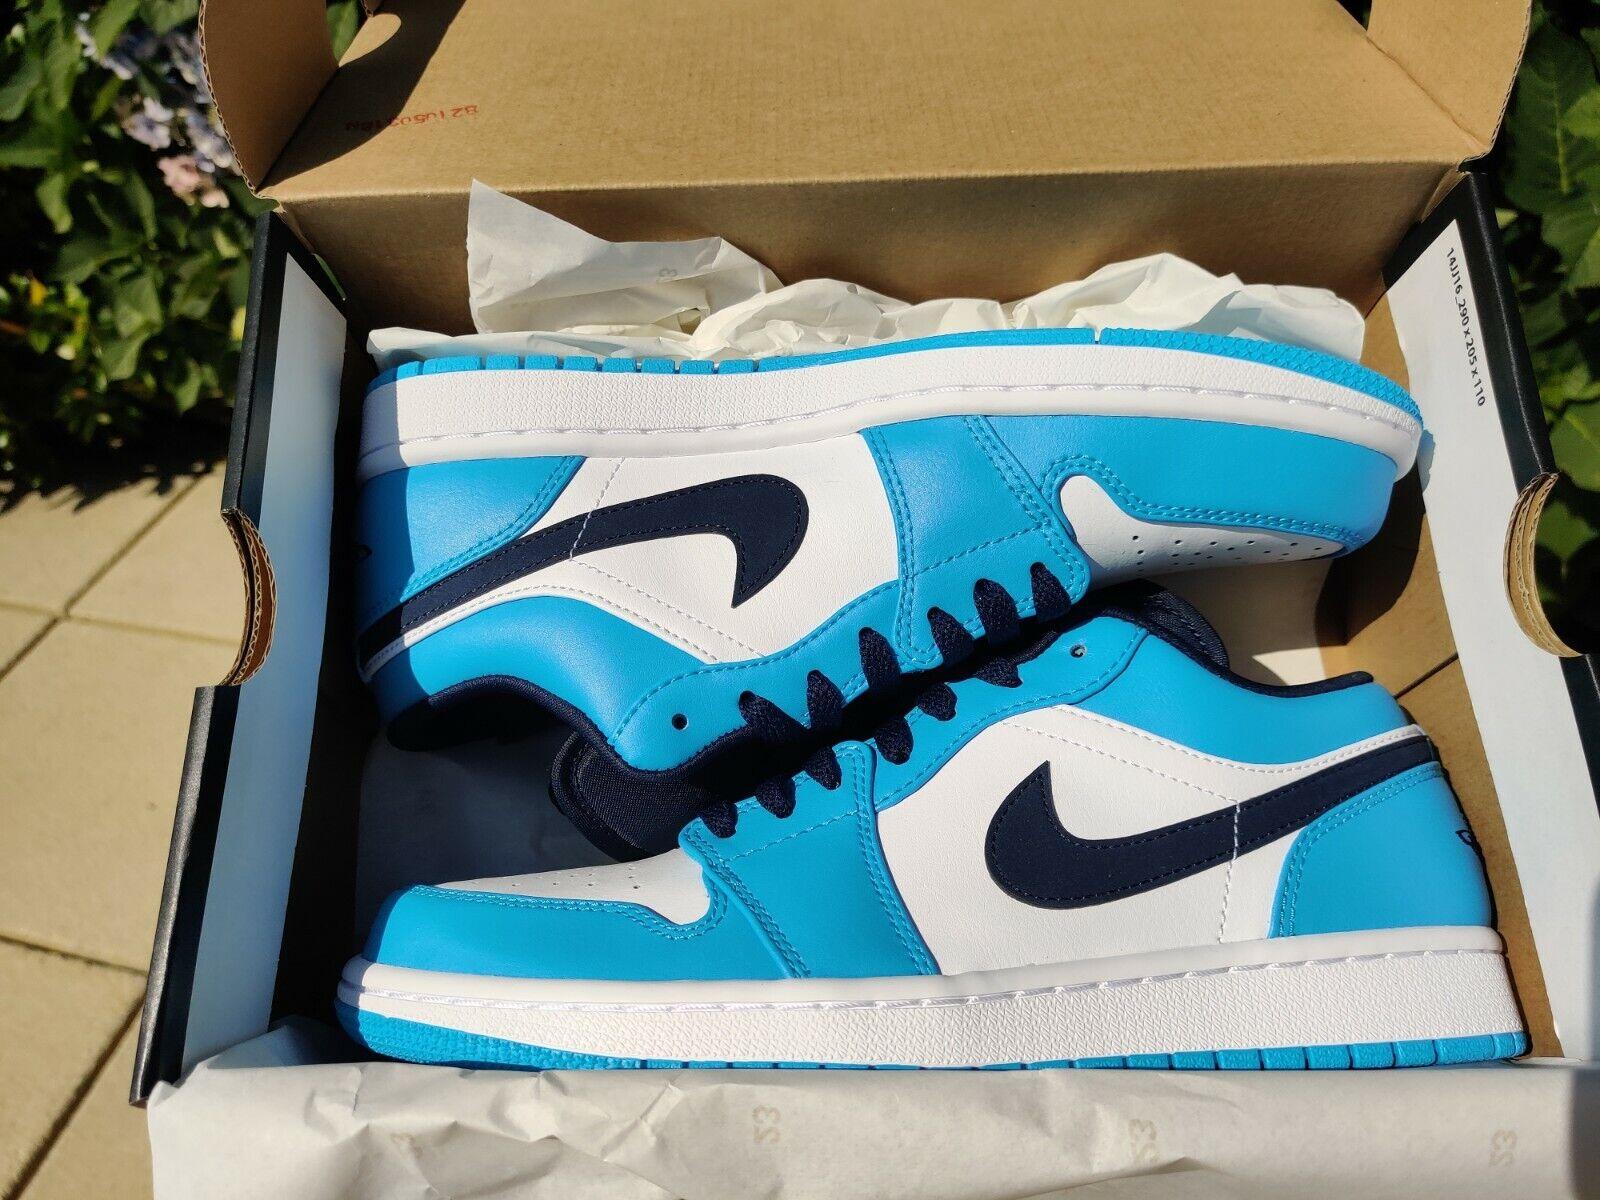 Nike Air Jordan 1 Low UNC / University Blue / Obsidian -Brand New- UK11 ✅